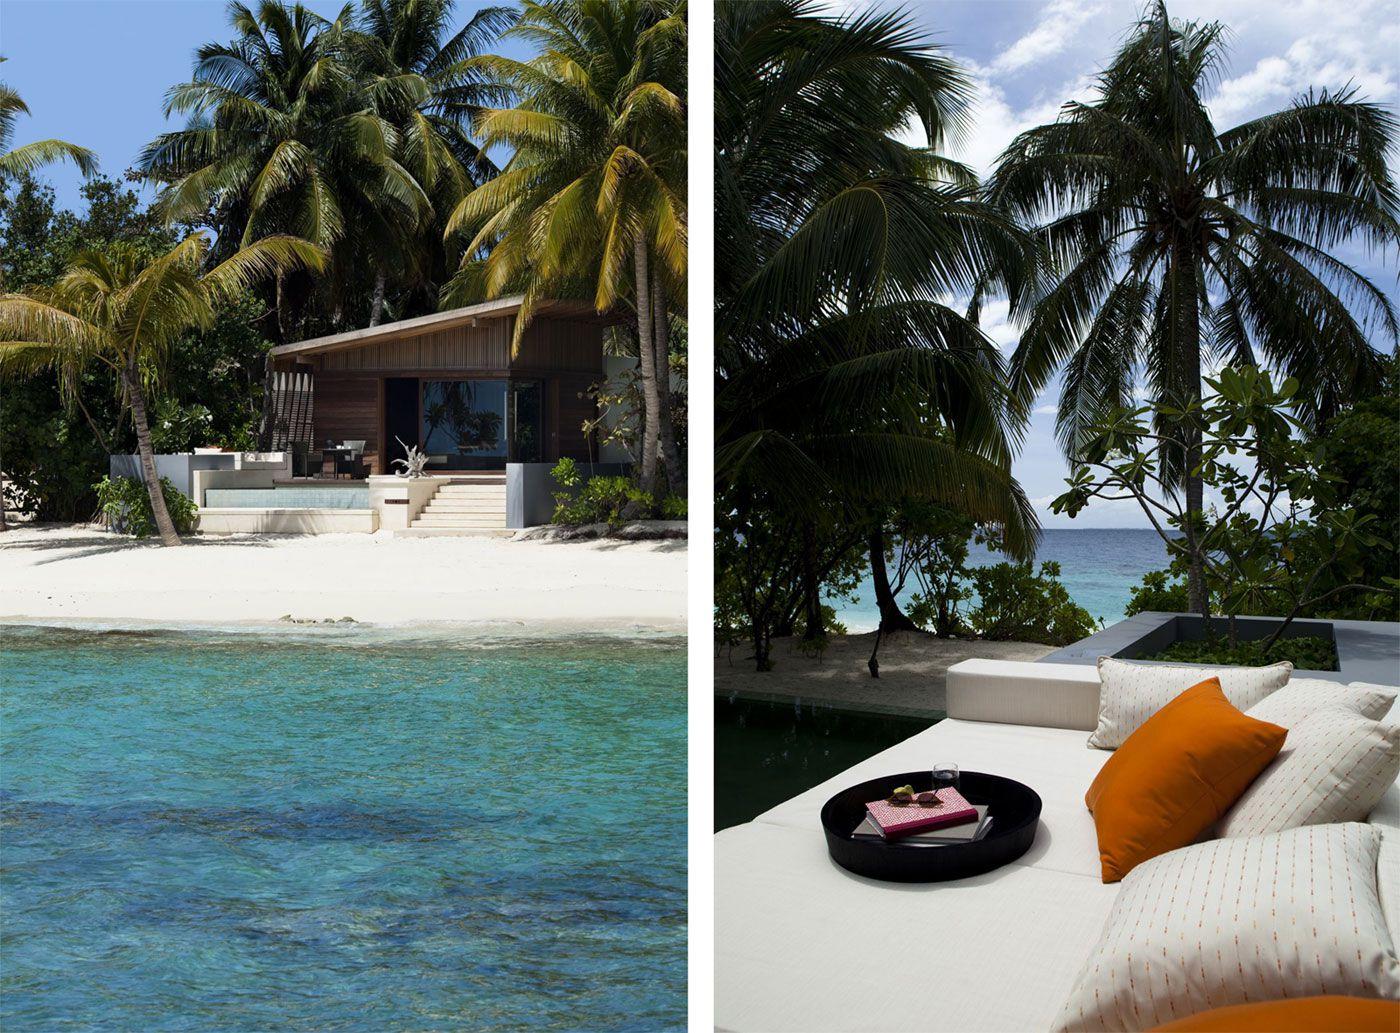 Alila-Villas-Hadahaa-in-Maldives-02-1